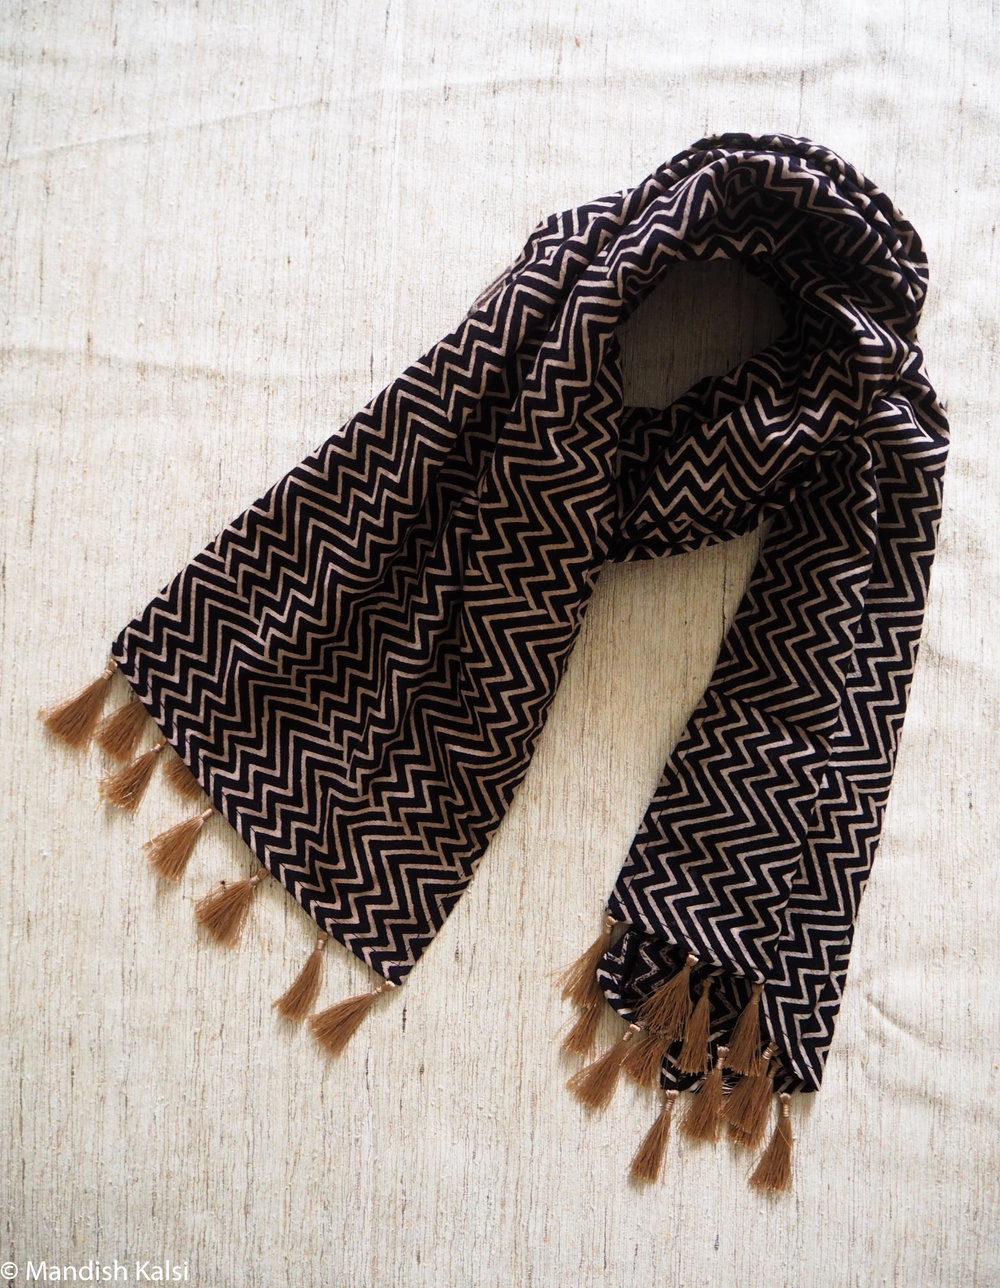 Black & Beige chevron print - Medium scarf with tassels